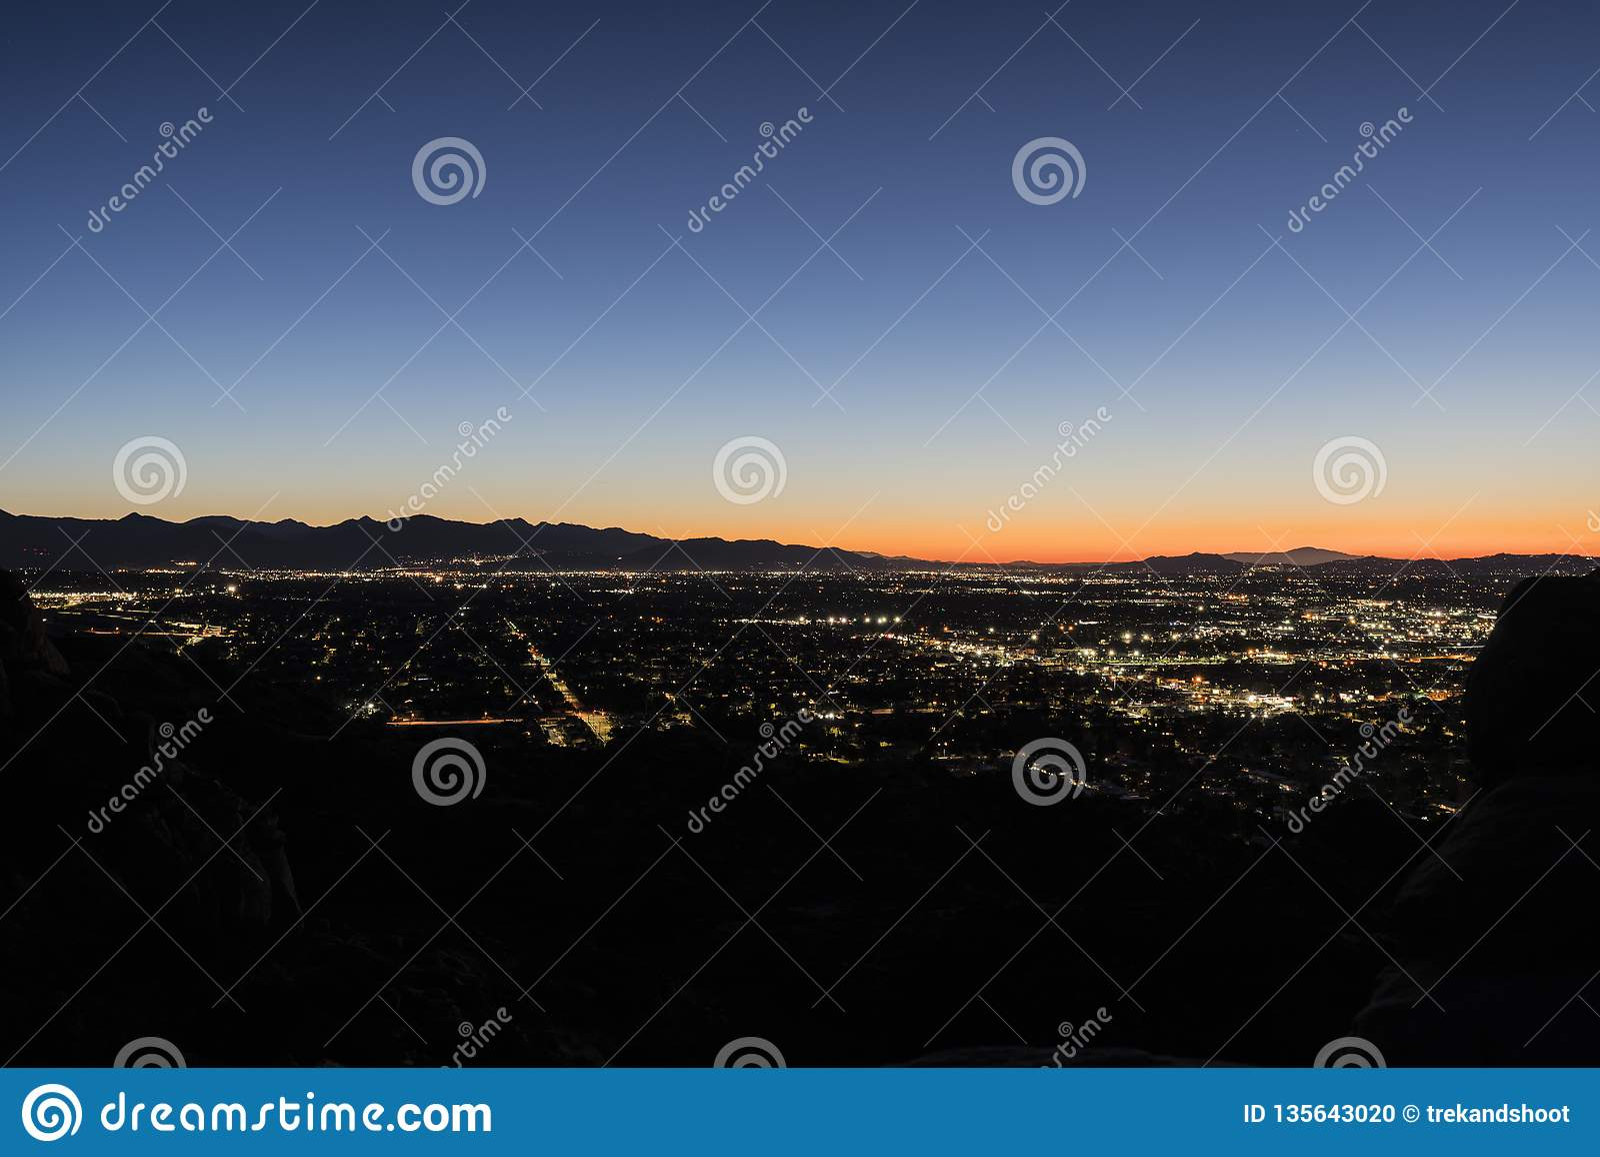 Predawn Los Angeles California San Fernando Valley Stock Photo ...